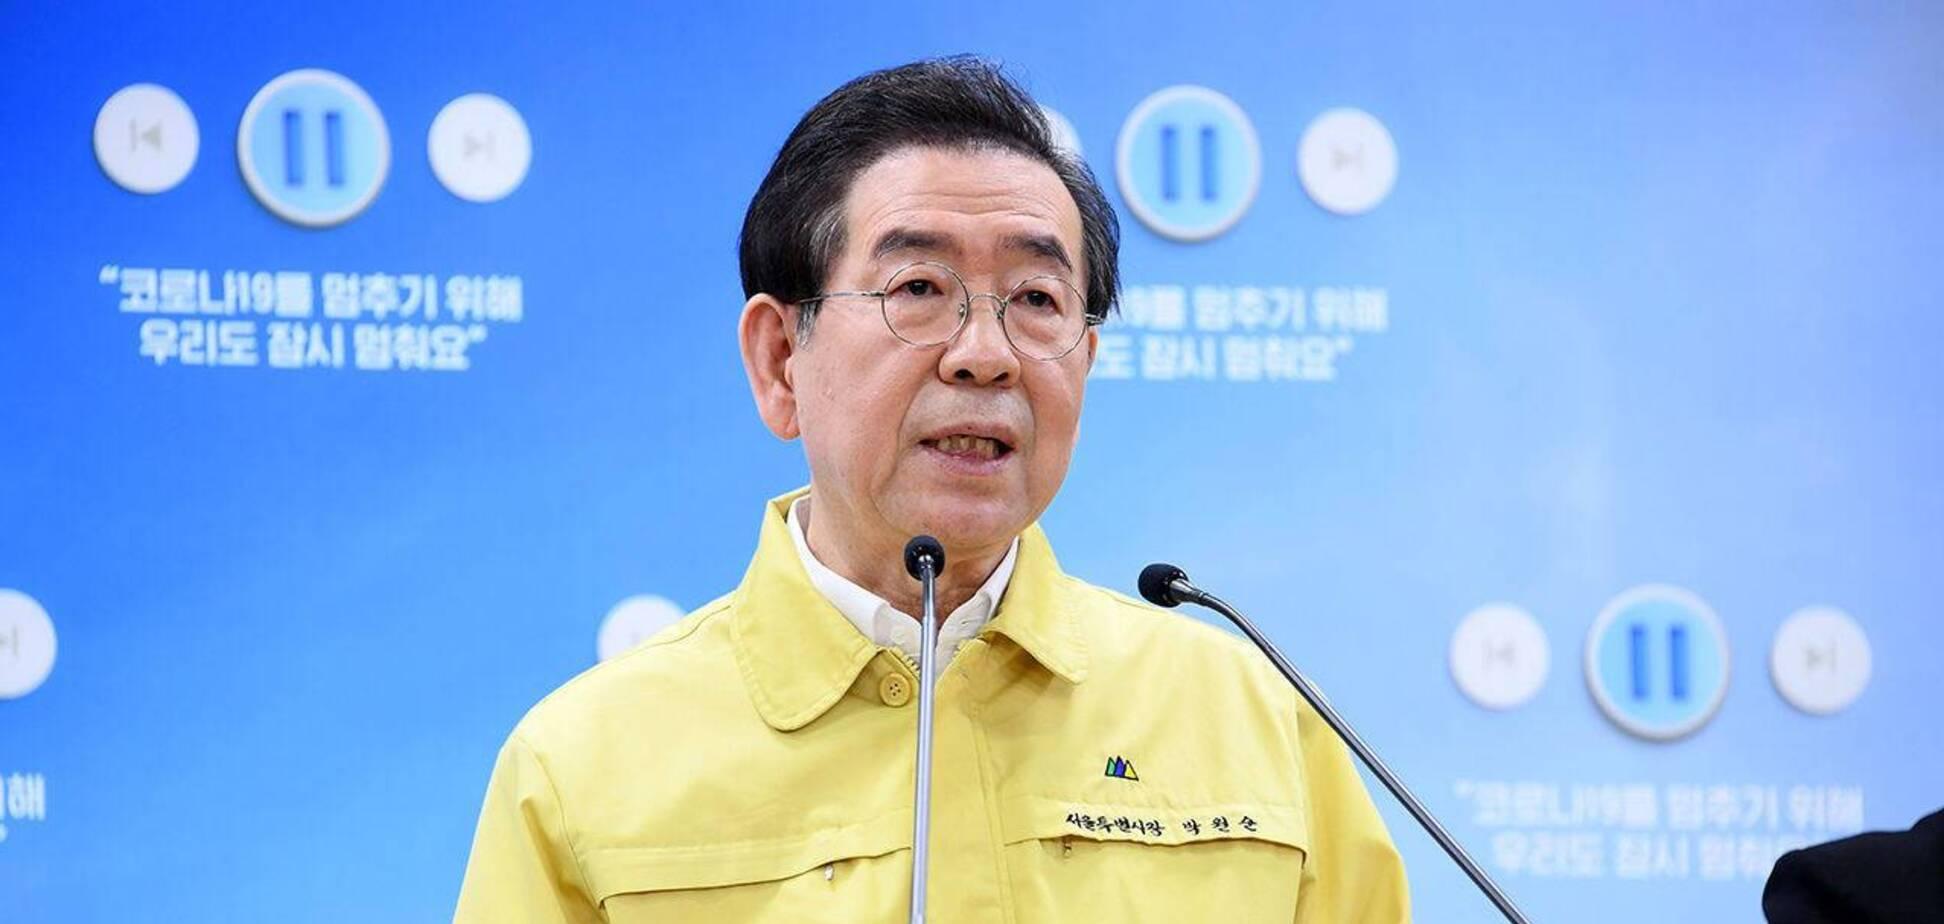 Мэр Сеула Пак Вон Сун